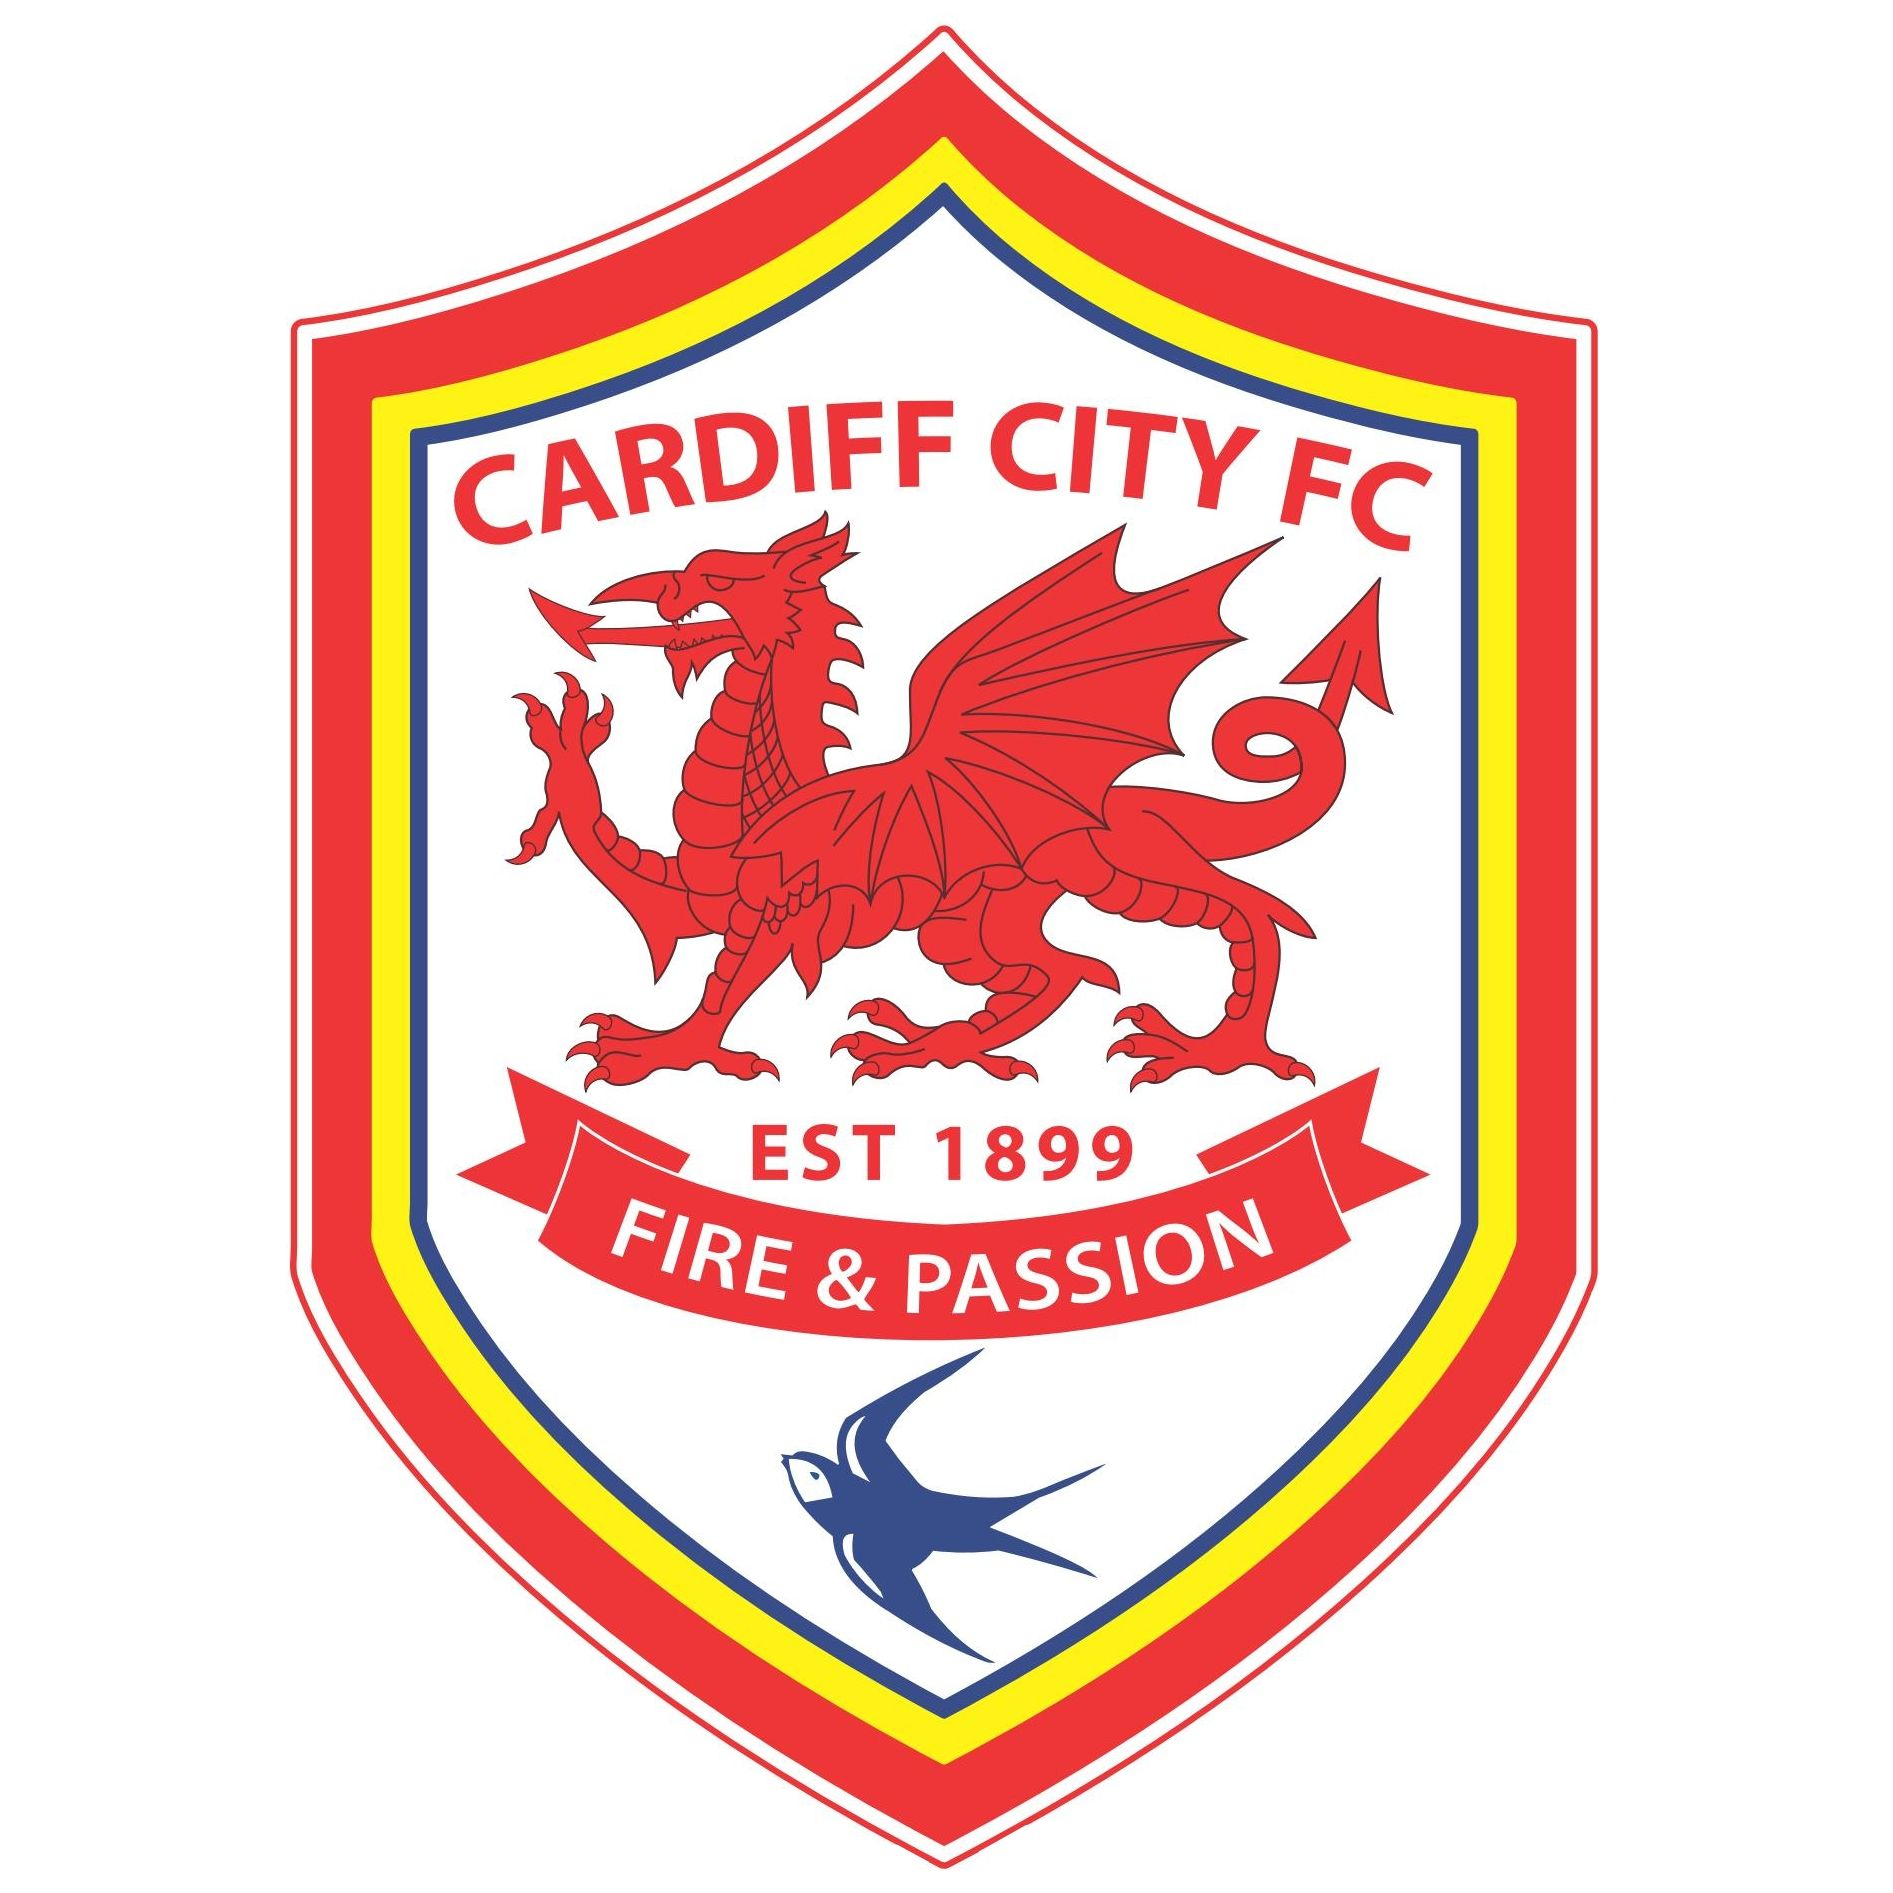 Cardiff city football club logo footballsoccer logos